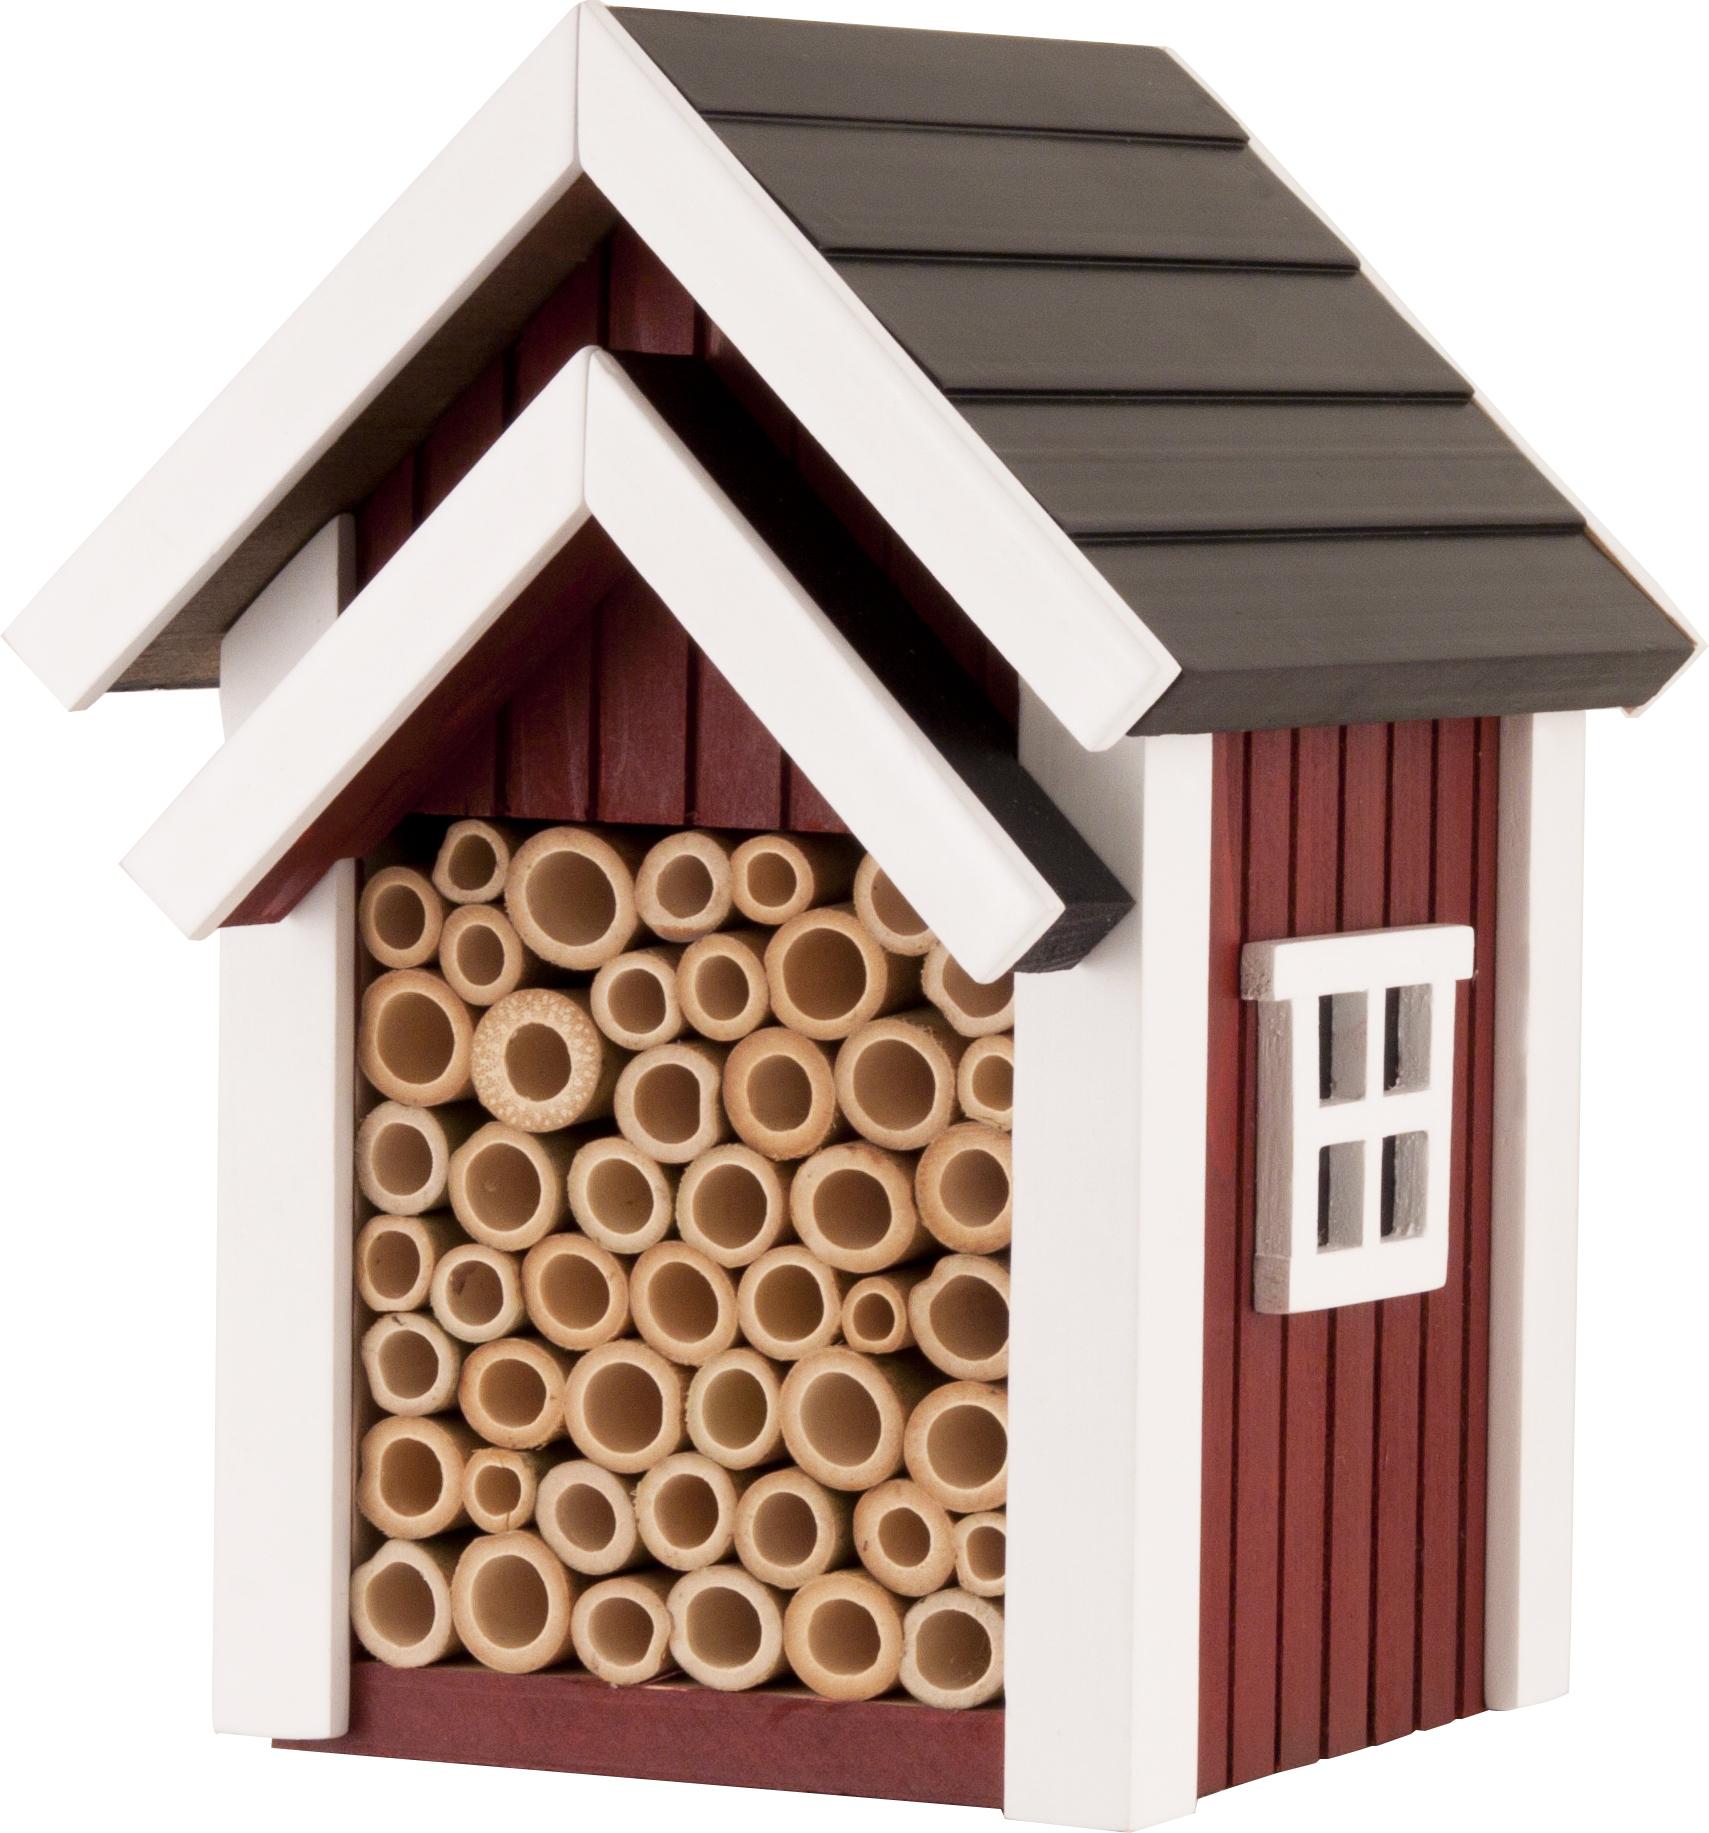 Nichoir pour abeilles Biholk